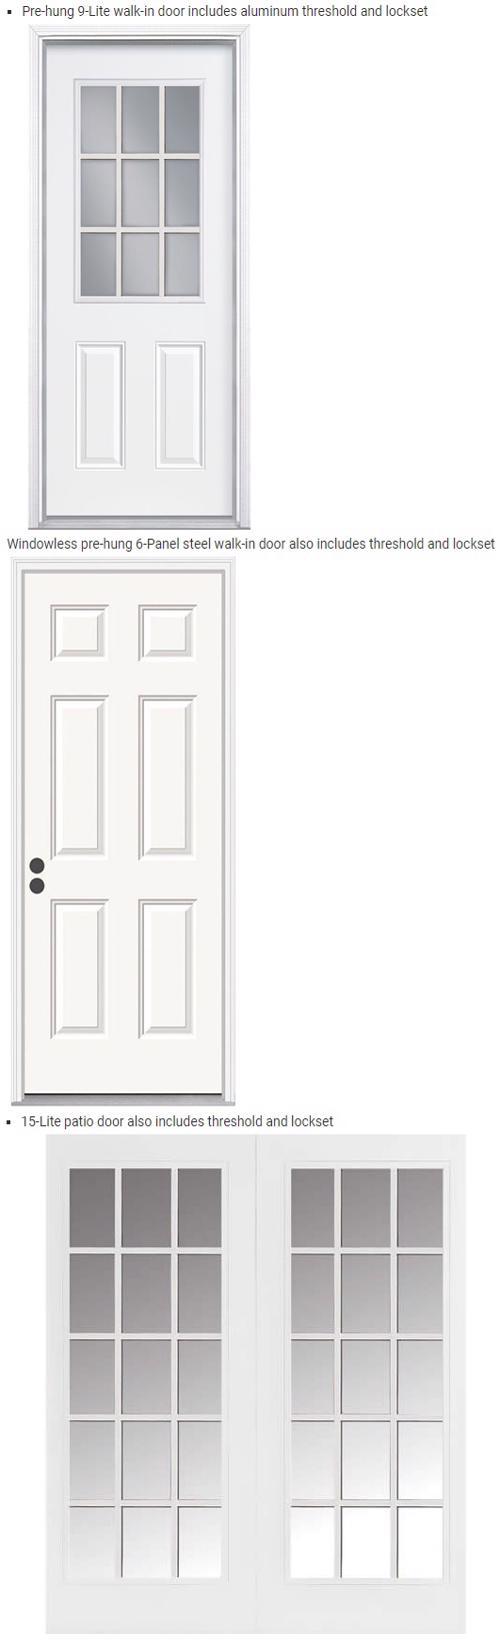 Best Barns Richmond 16x20 Wood Storage Shed Kit (richmond1620) Optional Walk-In Entry Door